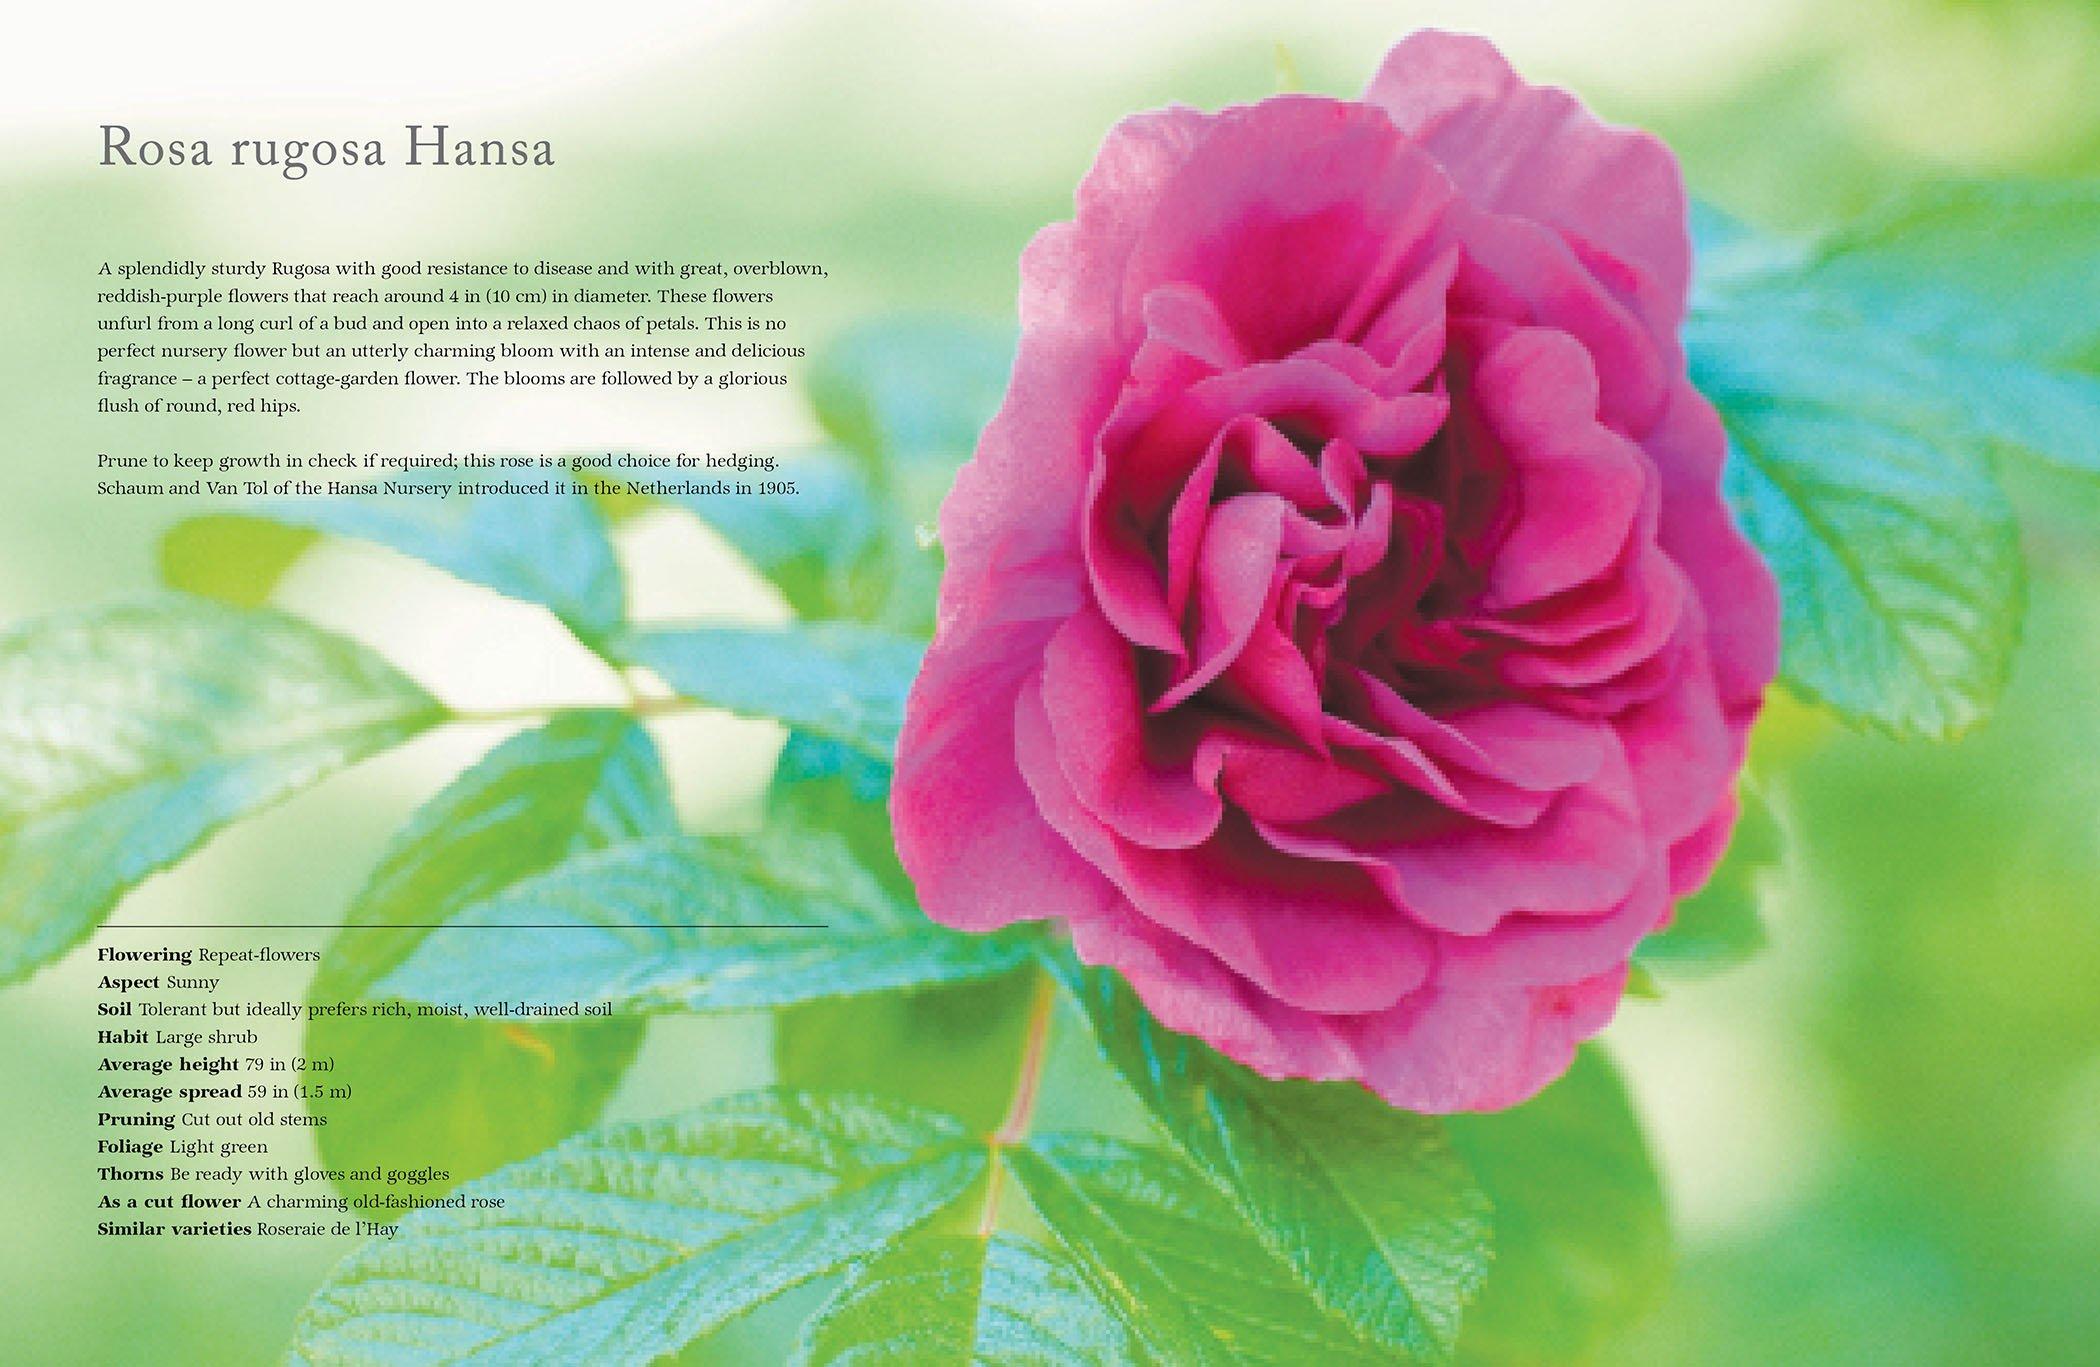 Vintage Roses Beautiful Varieties For Home And Garden Jane Eastoe